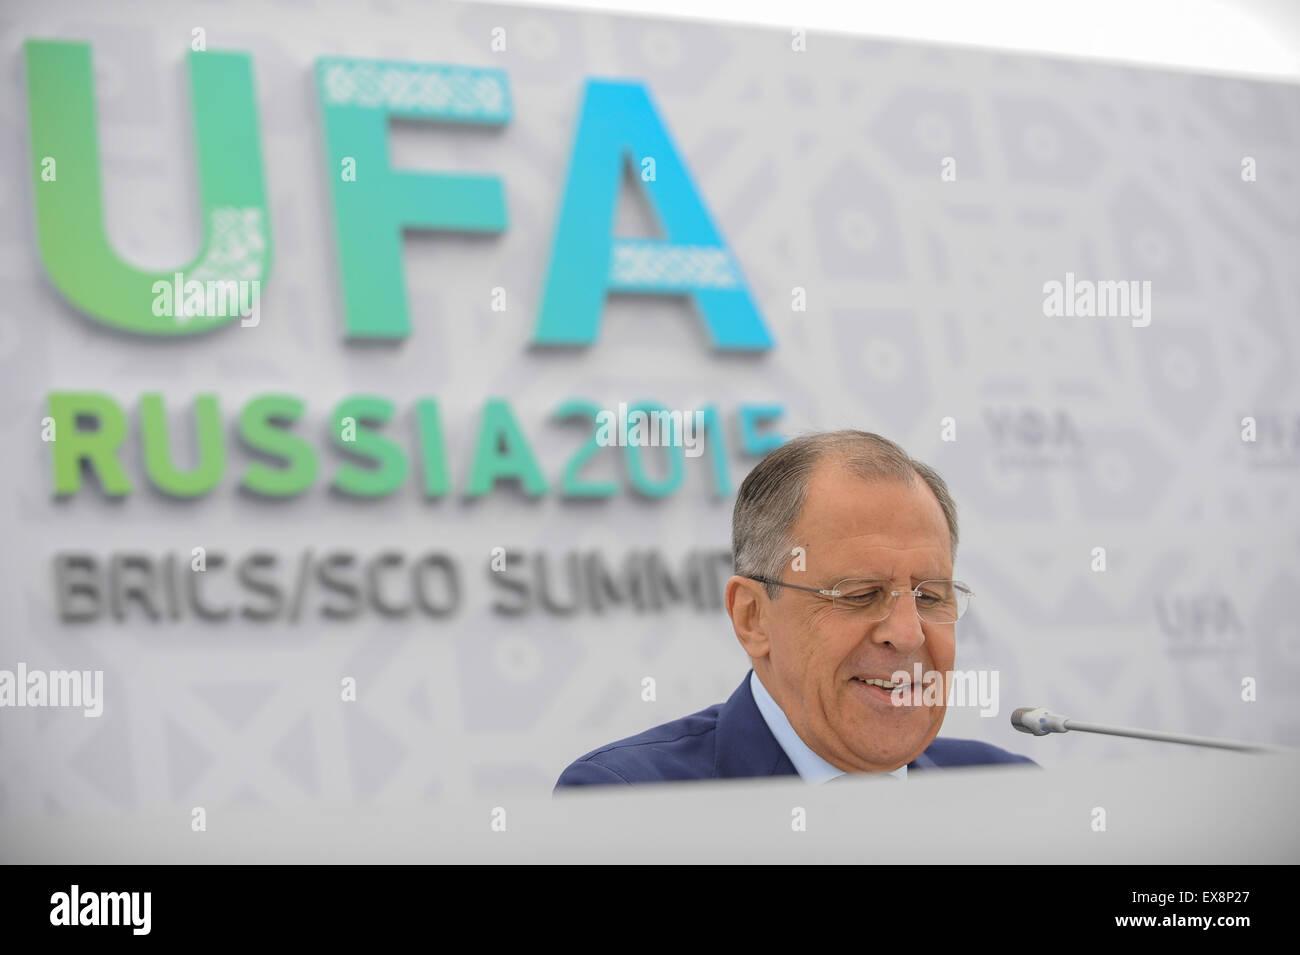 Ufa, Russia. 9th July, 2015. Russian Foregin Minister Sergei Lavrov addresses a press briefing in Ufa, Russia, July - Stock Image